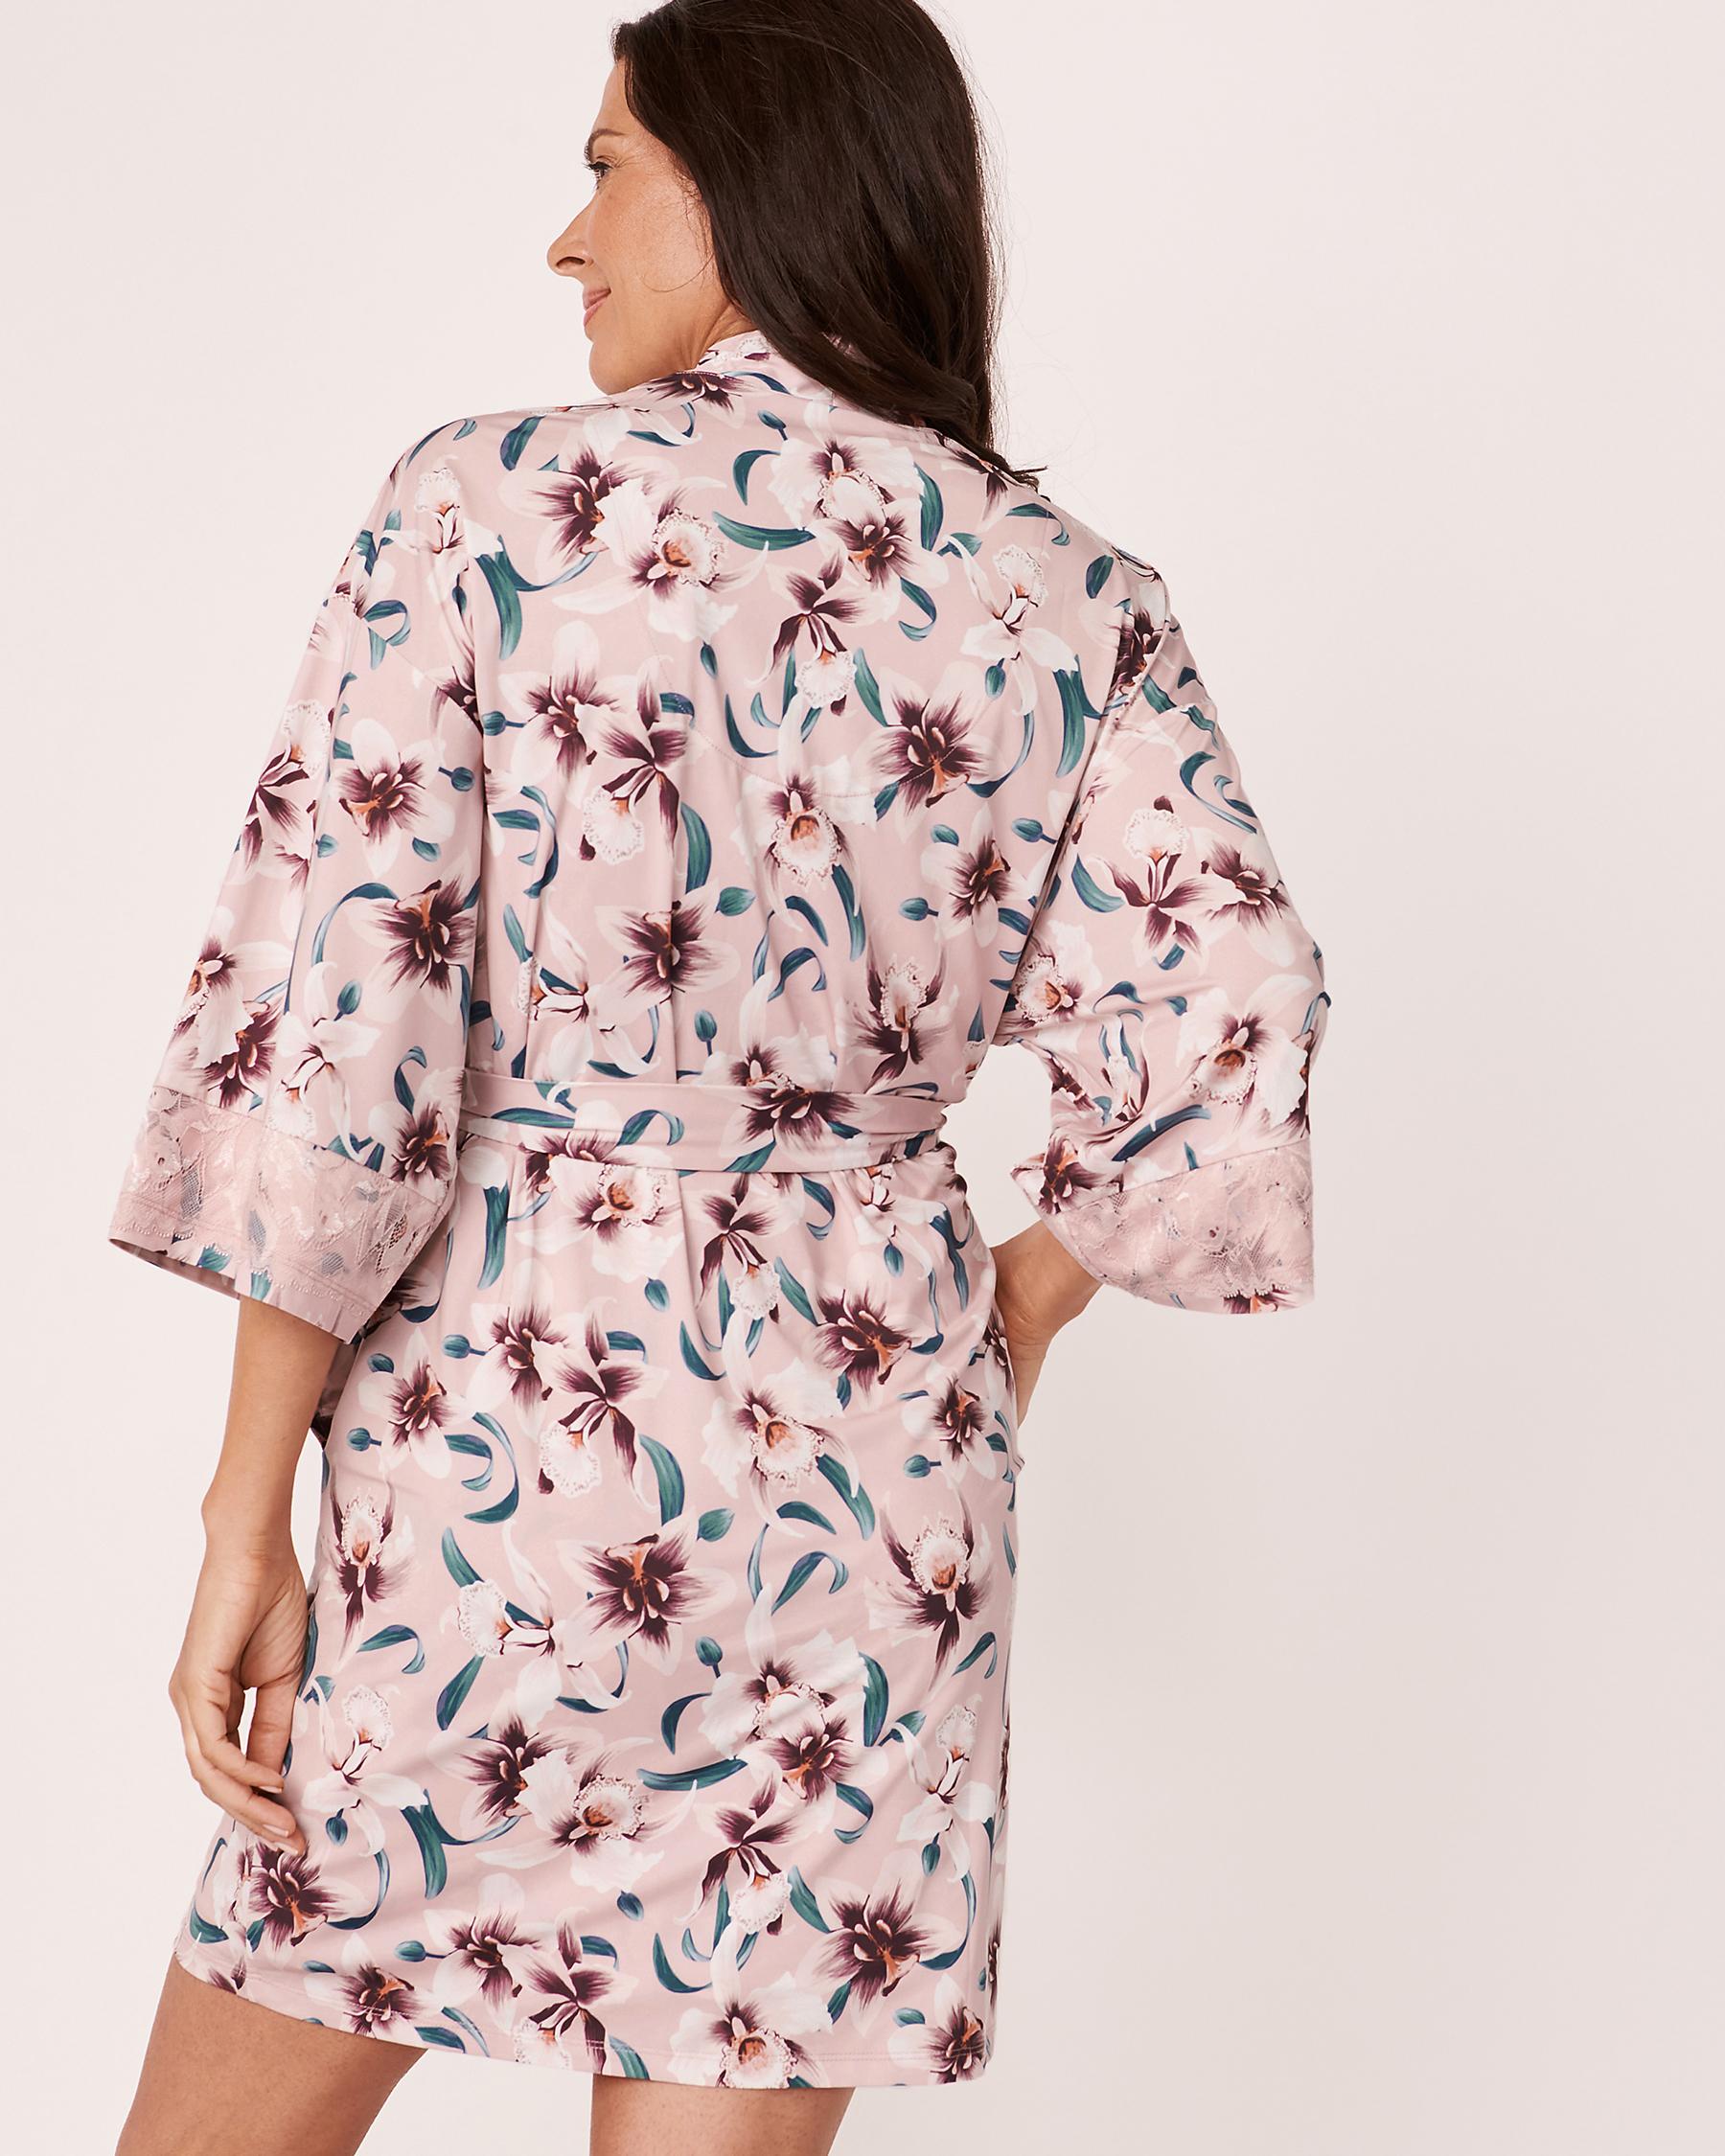 LA VIE EN ROSE Recycled Fibers Lace Trim Kimono Orchids 60600008 - View5